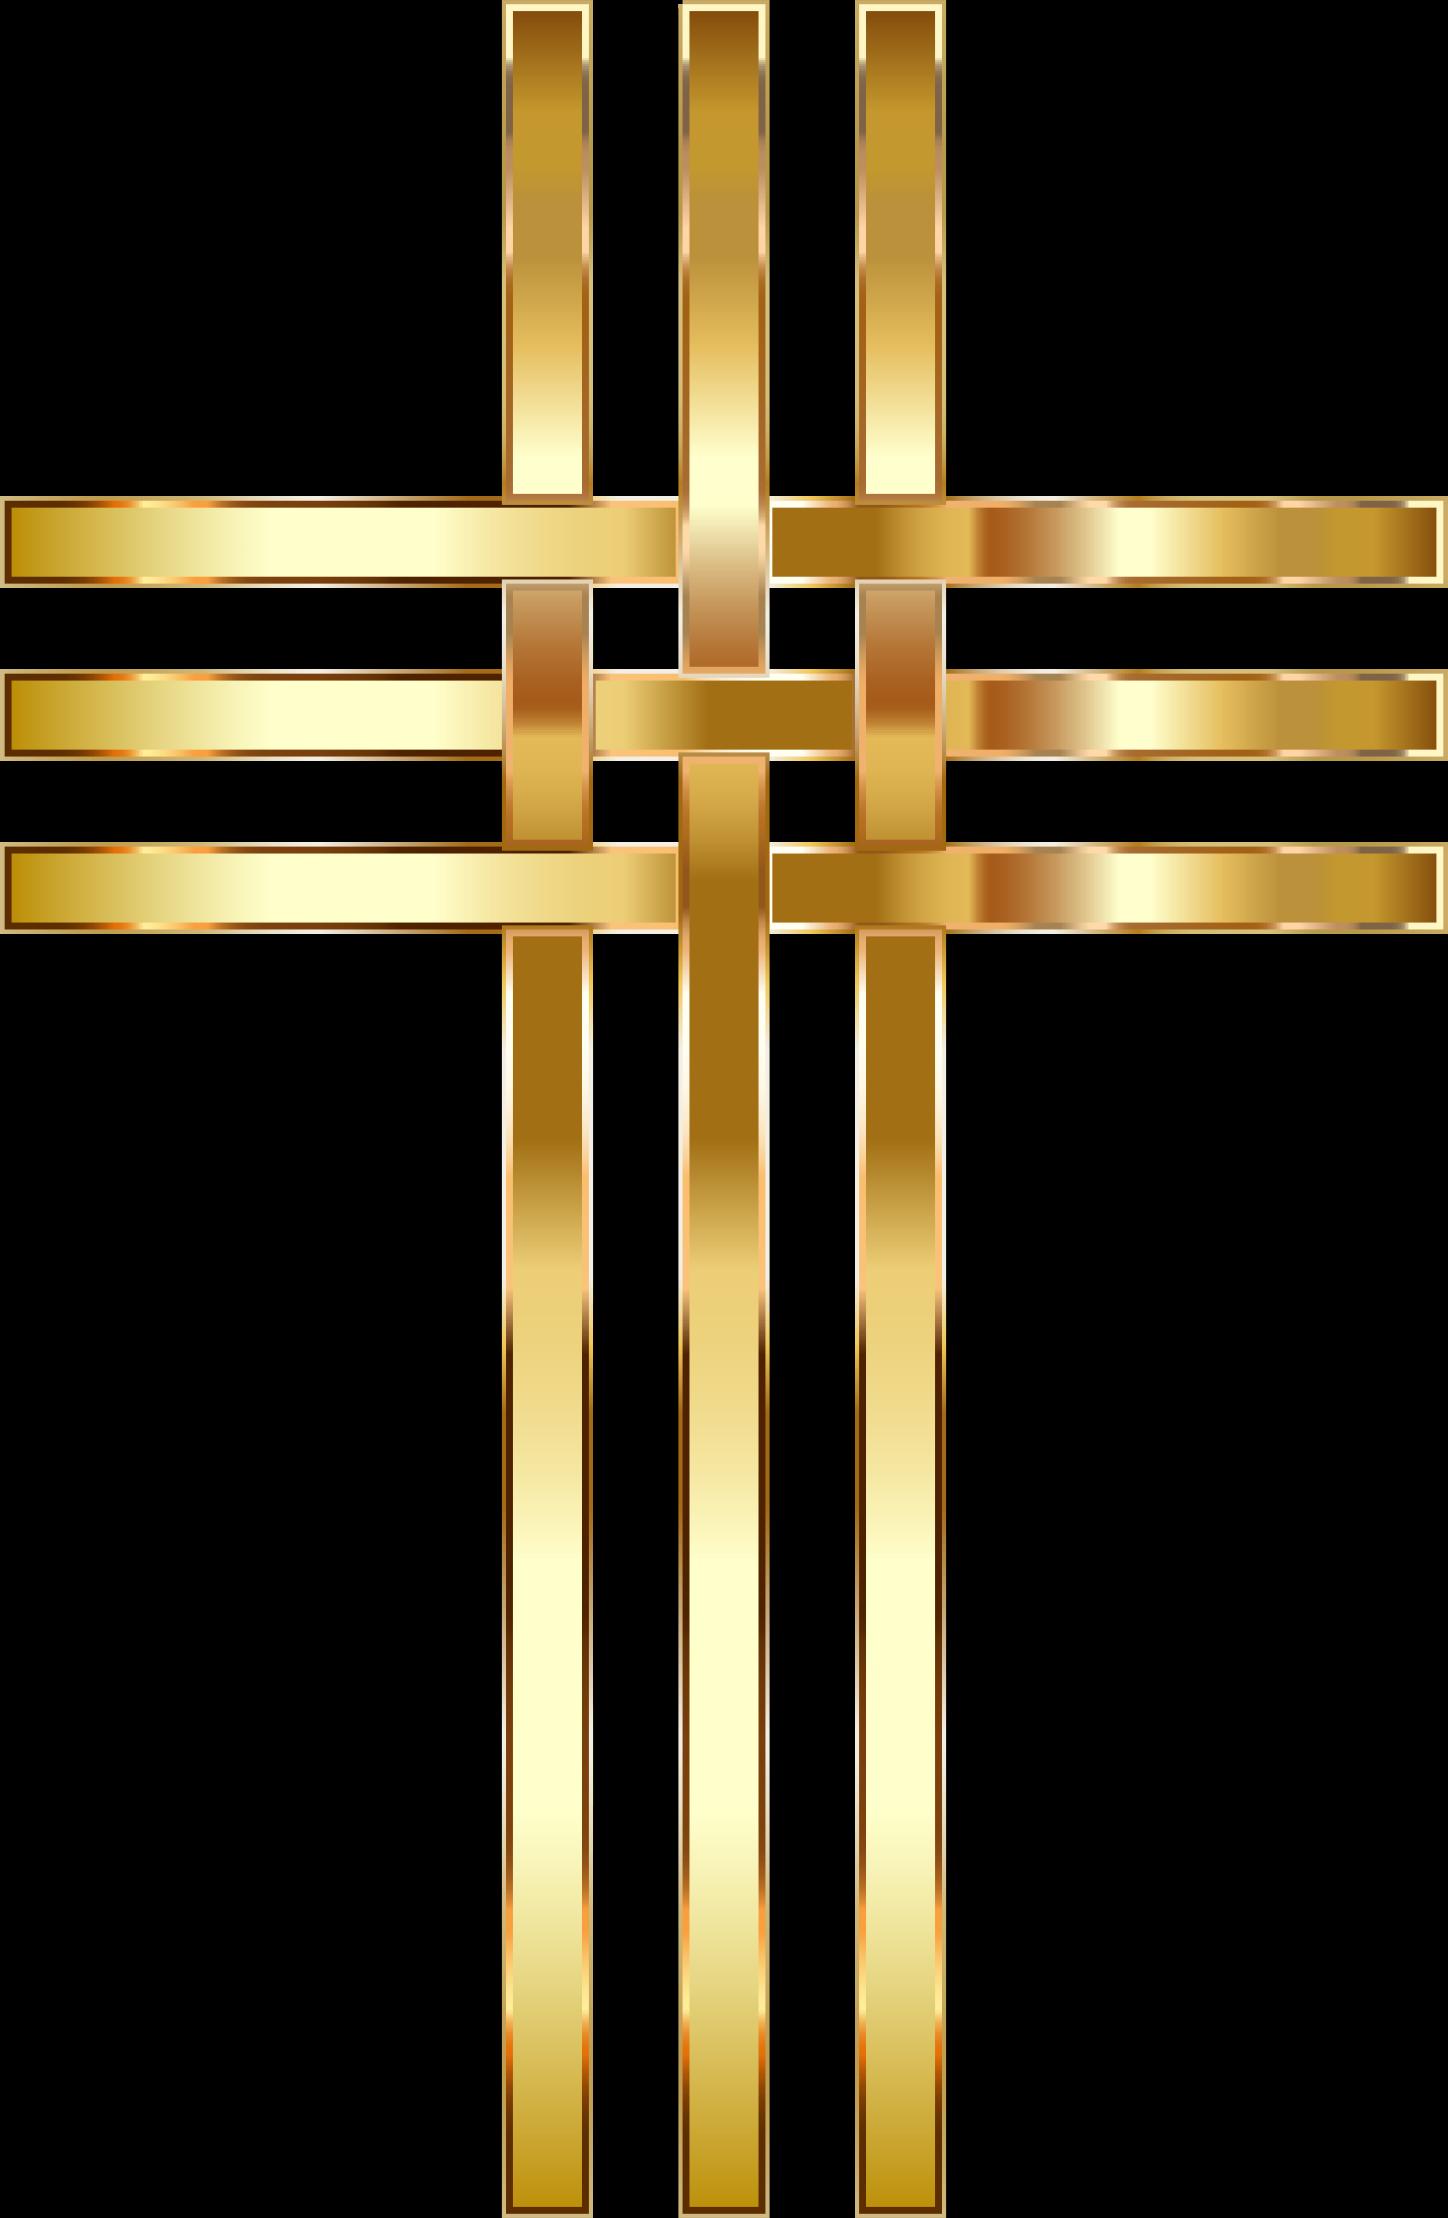 Clipart cross transparent background. Interlocked stylized golden no